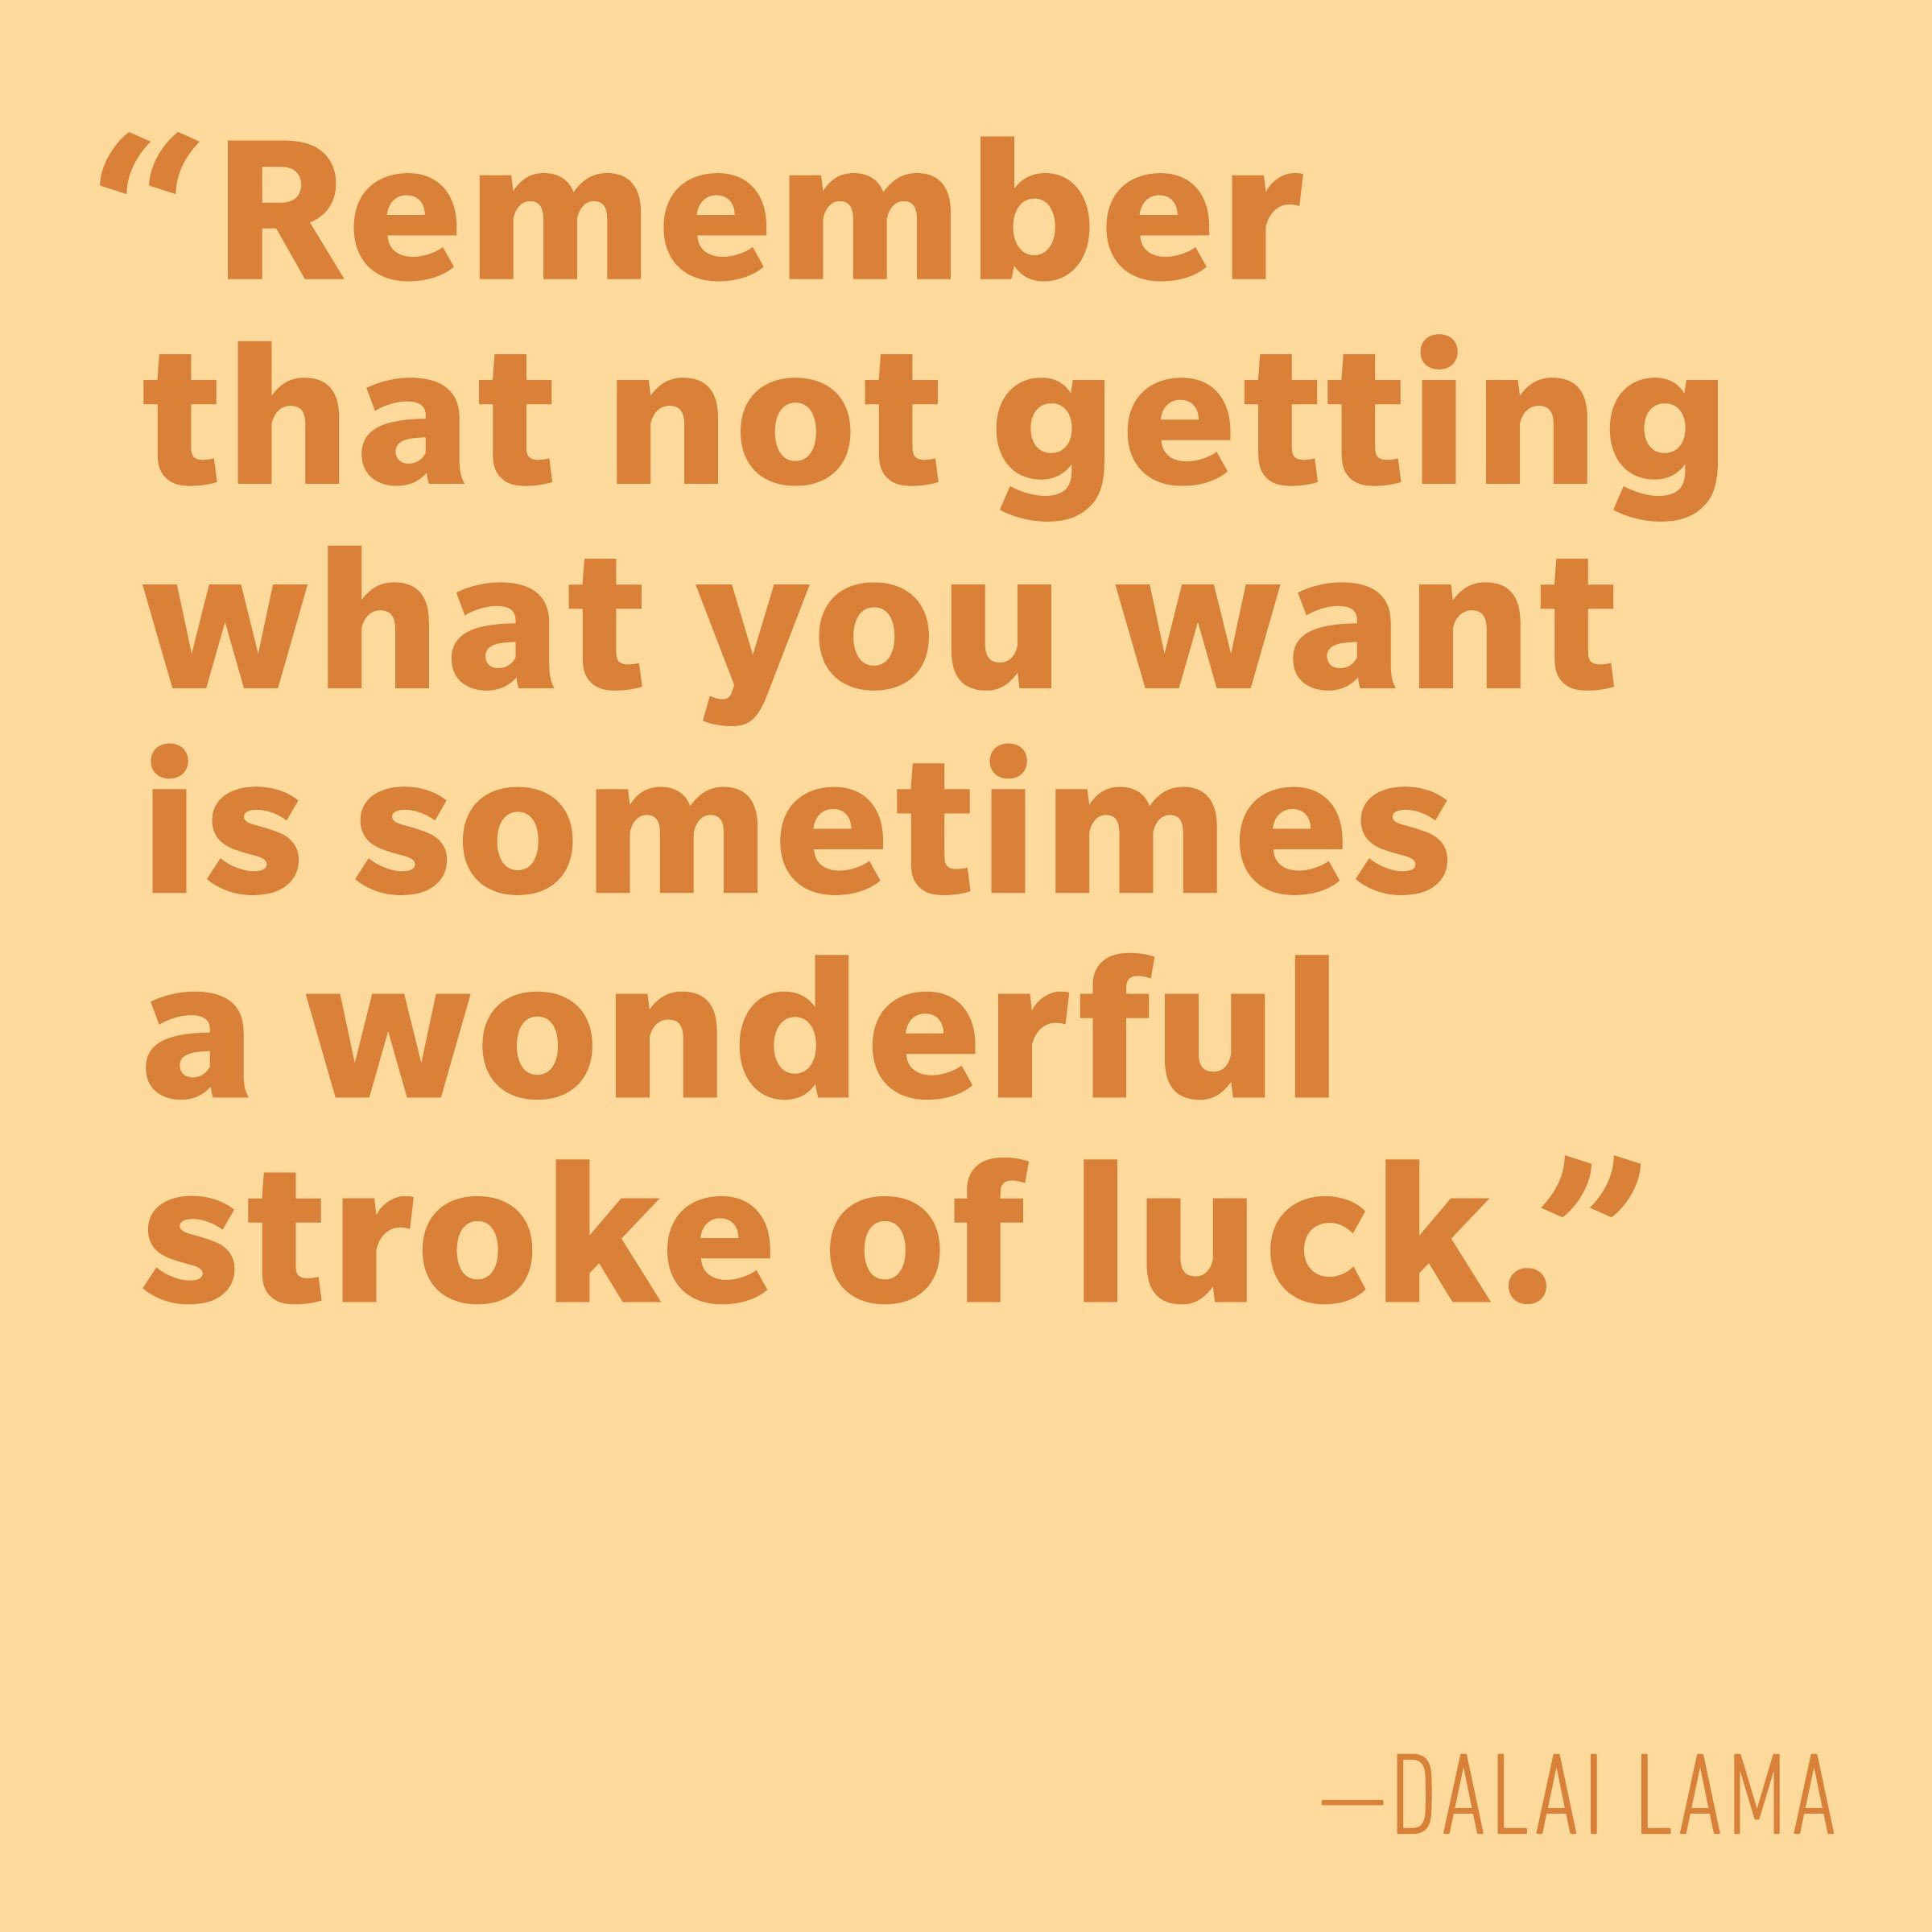 Motivational quotes - Dalai Lama